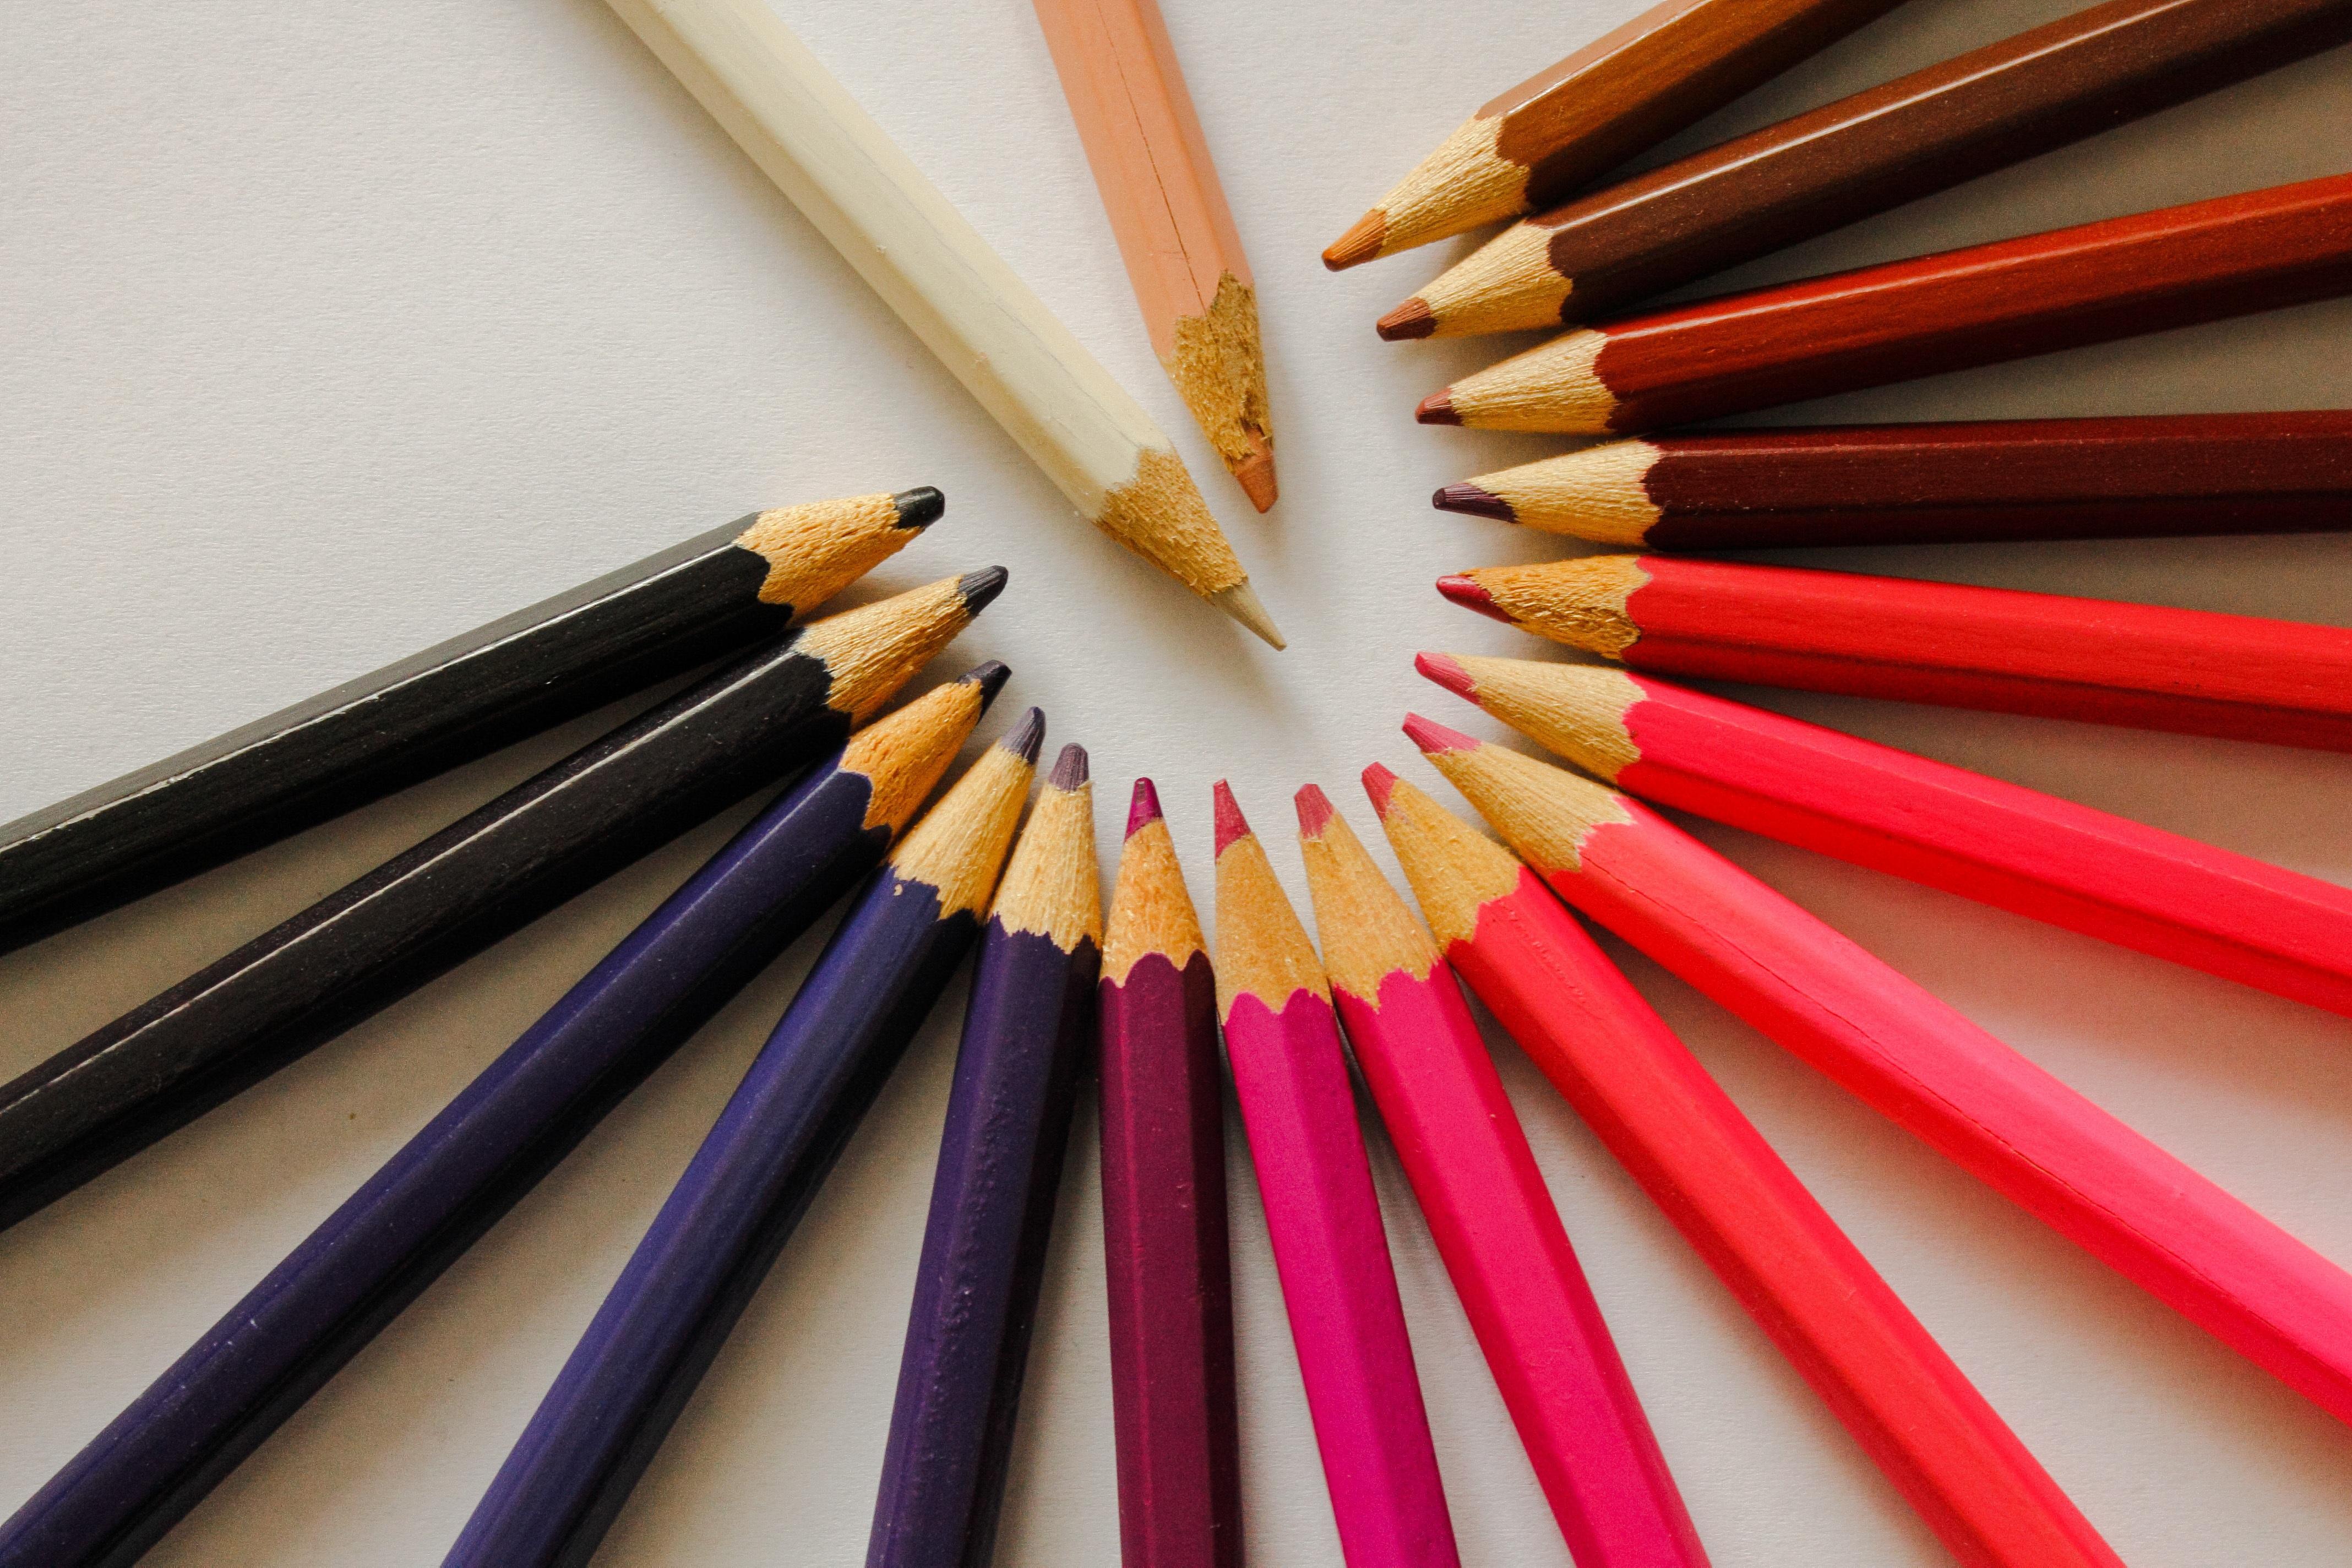 Fotos gratis : lápiz, blanco, línea, rojo, marrón, azul, negro ...